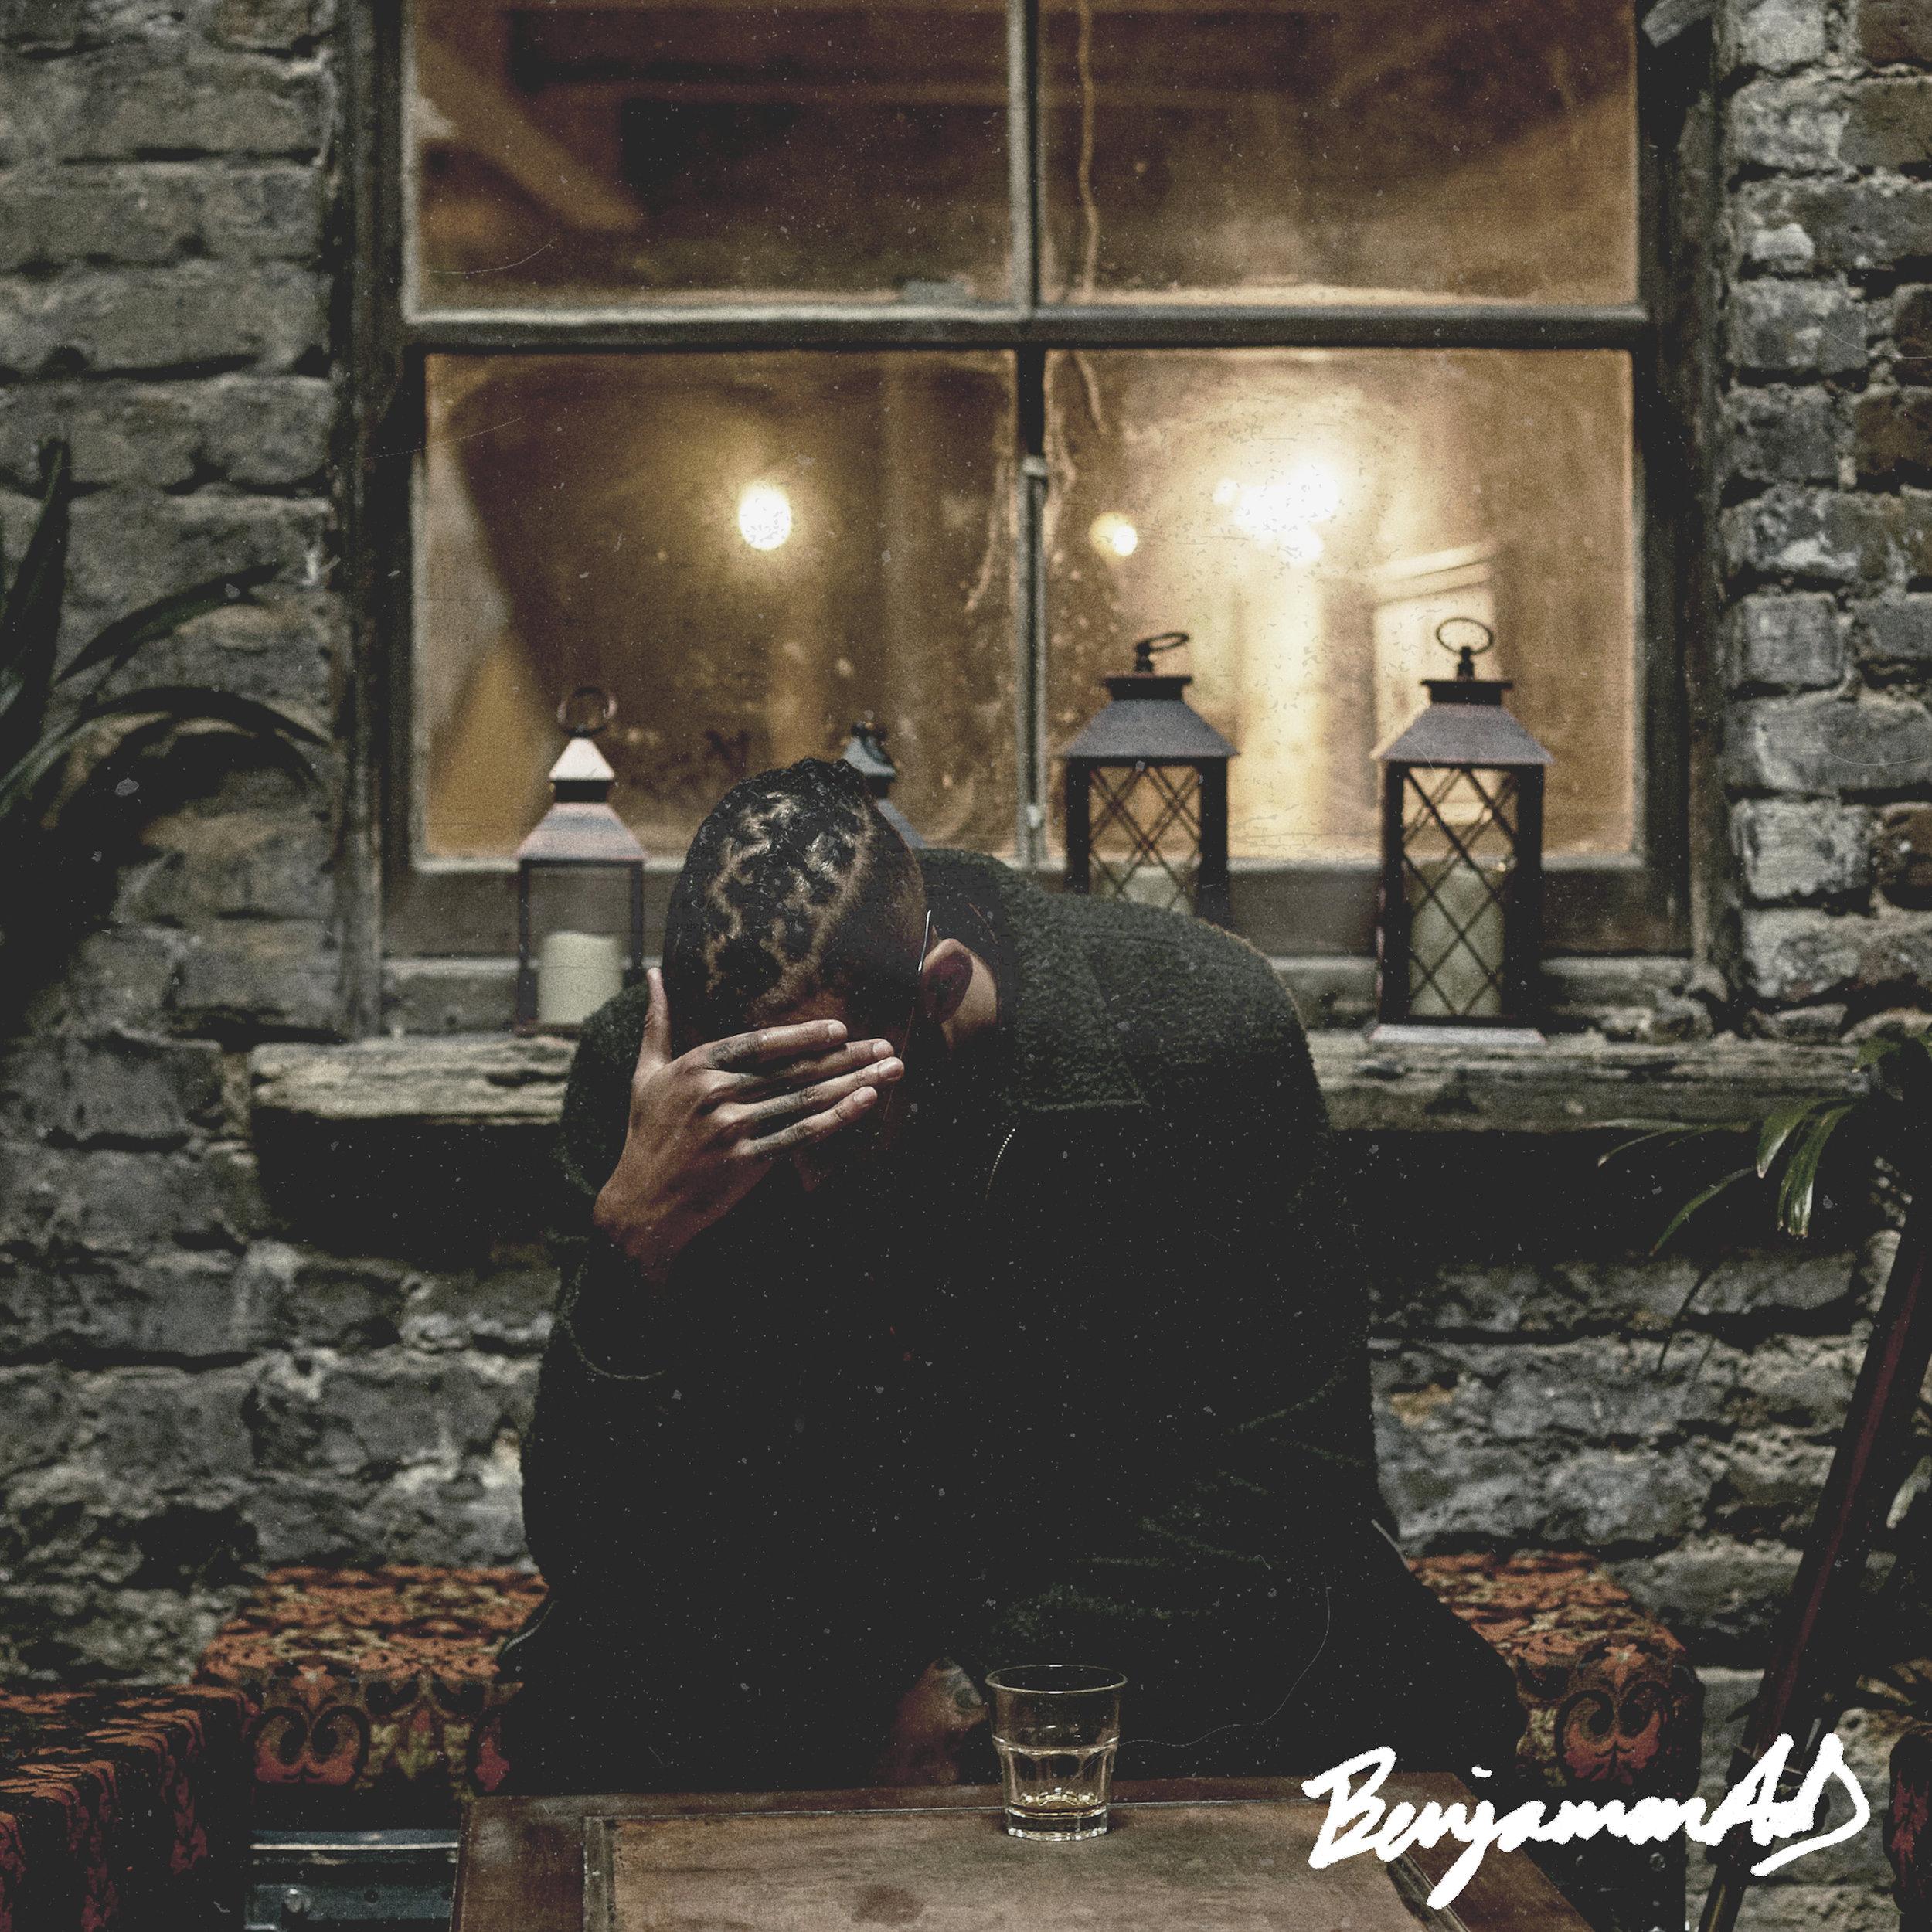 Benjamin A.D - When It Don't Make Sense - LISTEN / BUY